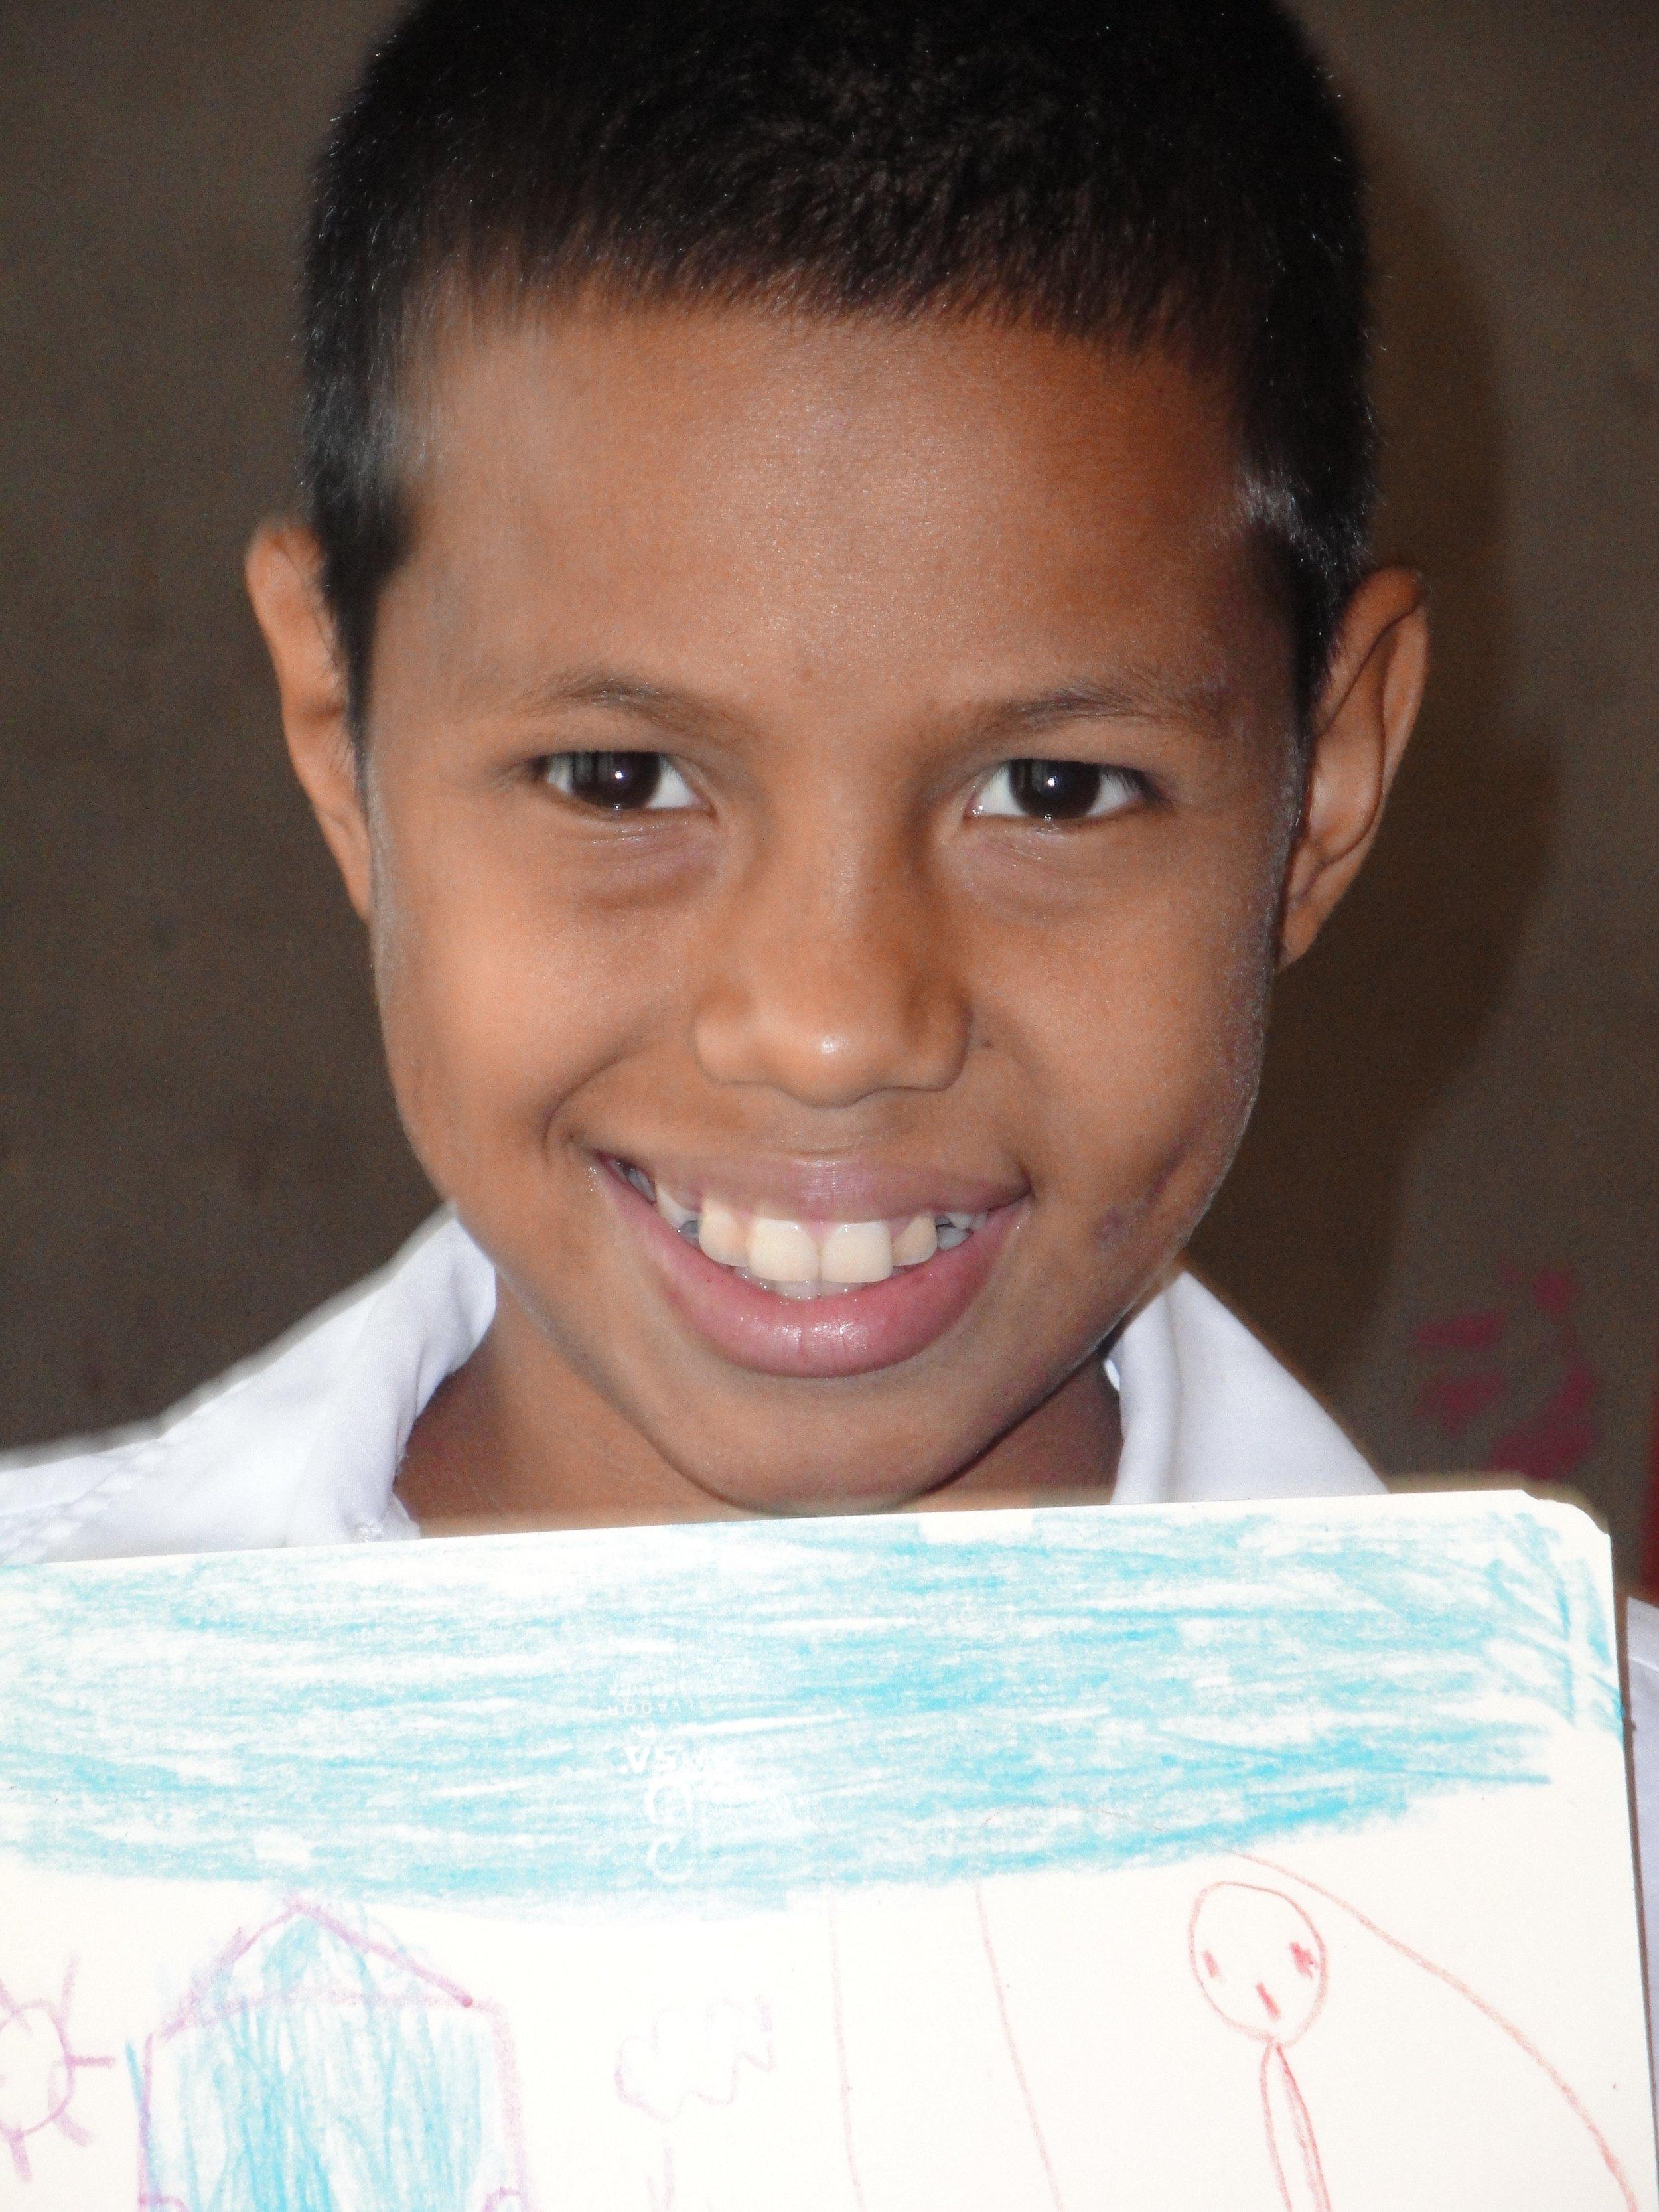 Proud 12-year-old Conrad displaying his art.